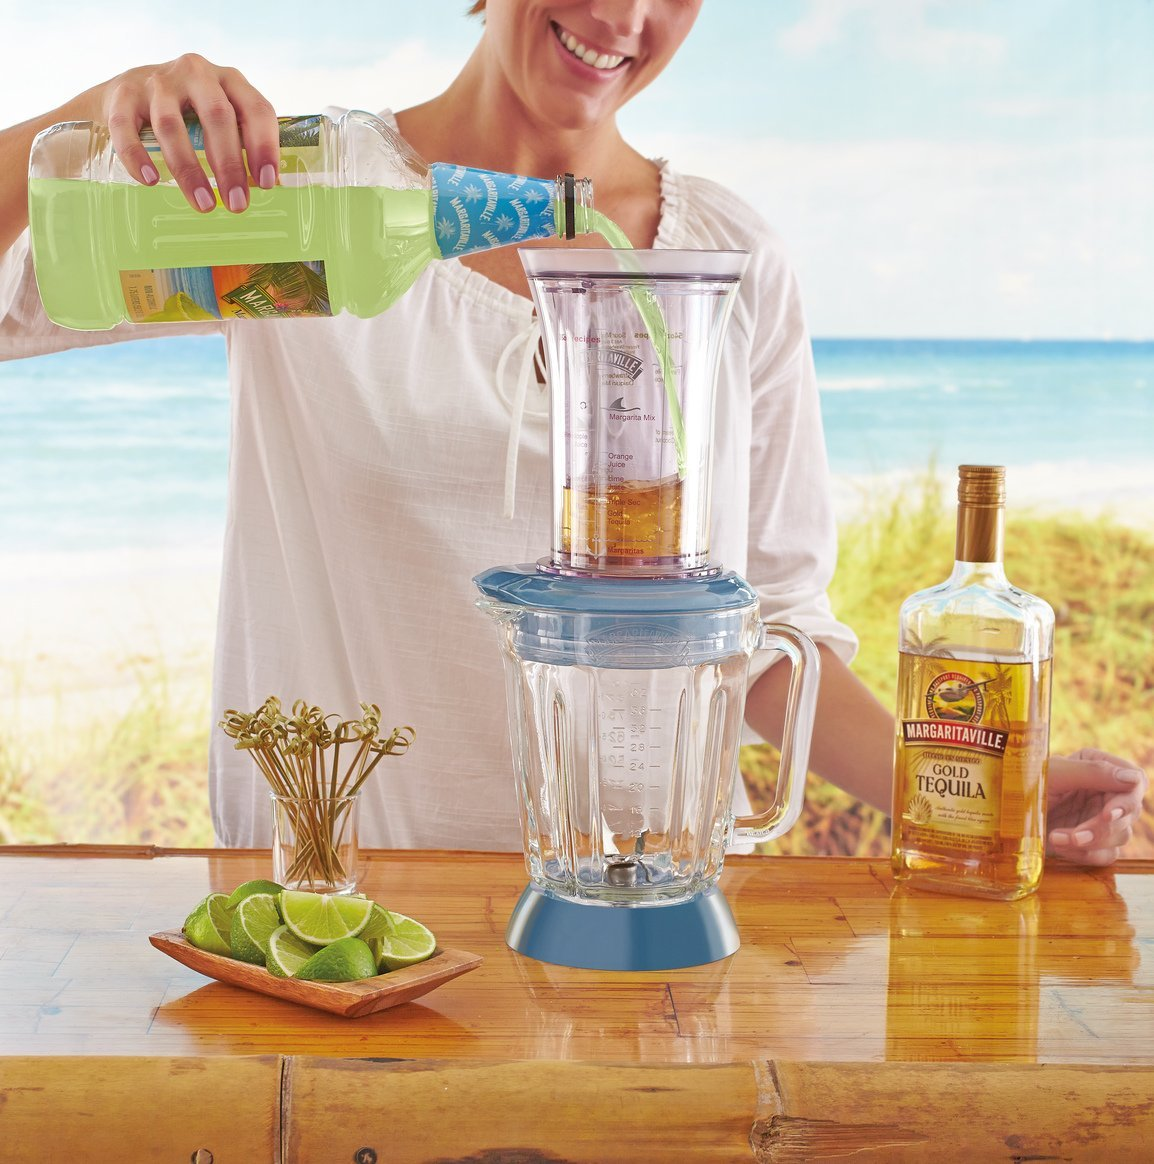 Margaritaville Key West Frozen Concoction Maker with Easy Pour Jar and XL Ice Reservoir, DM1900 by Margaritaville (Image #3)